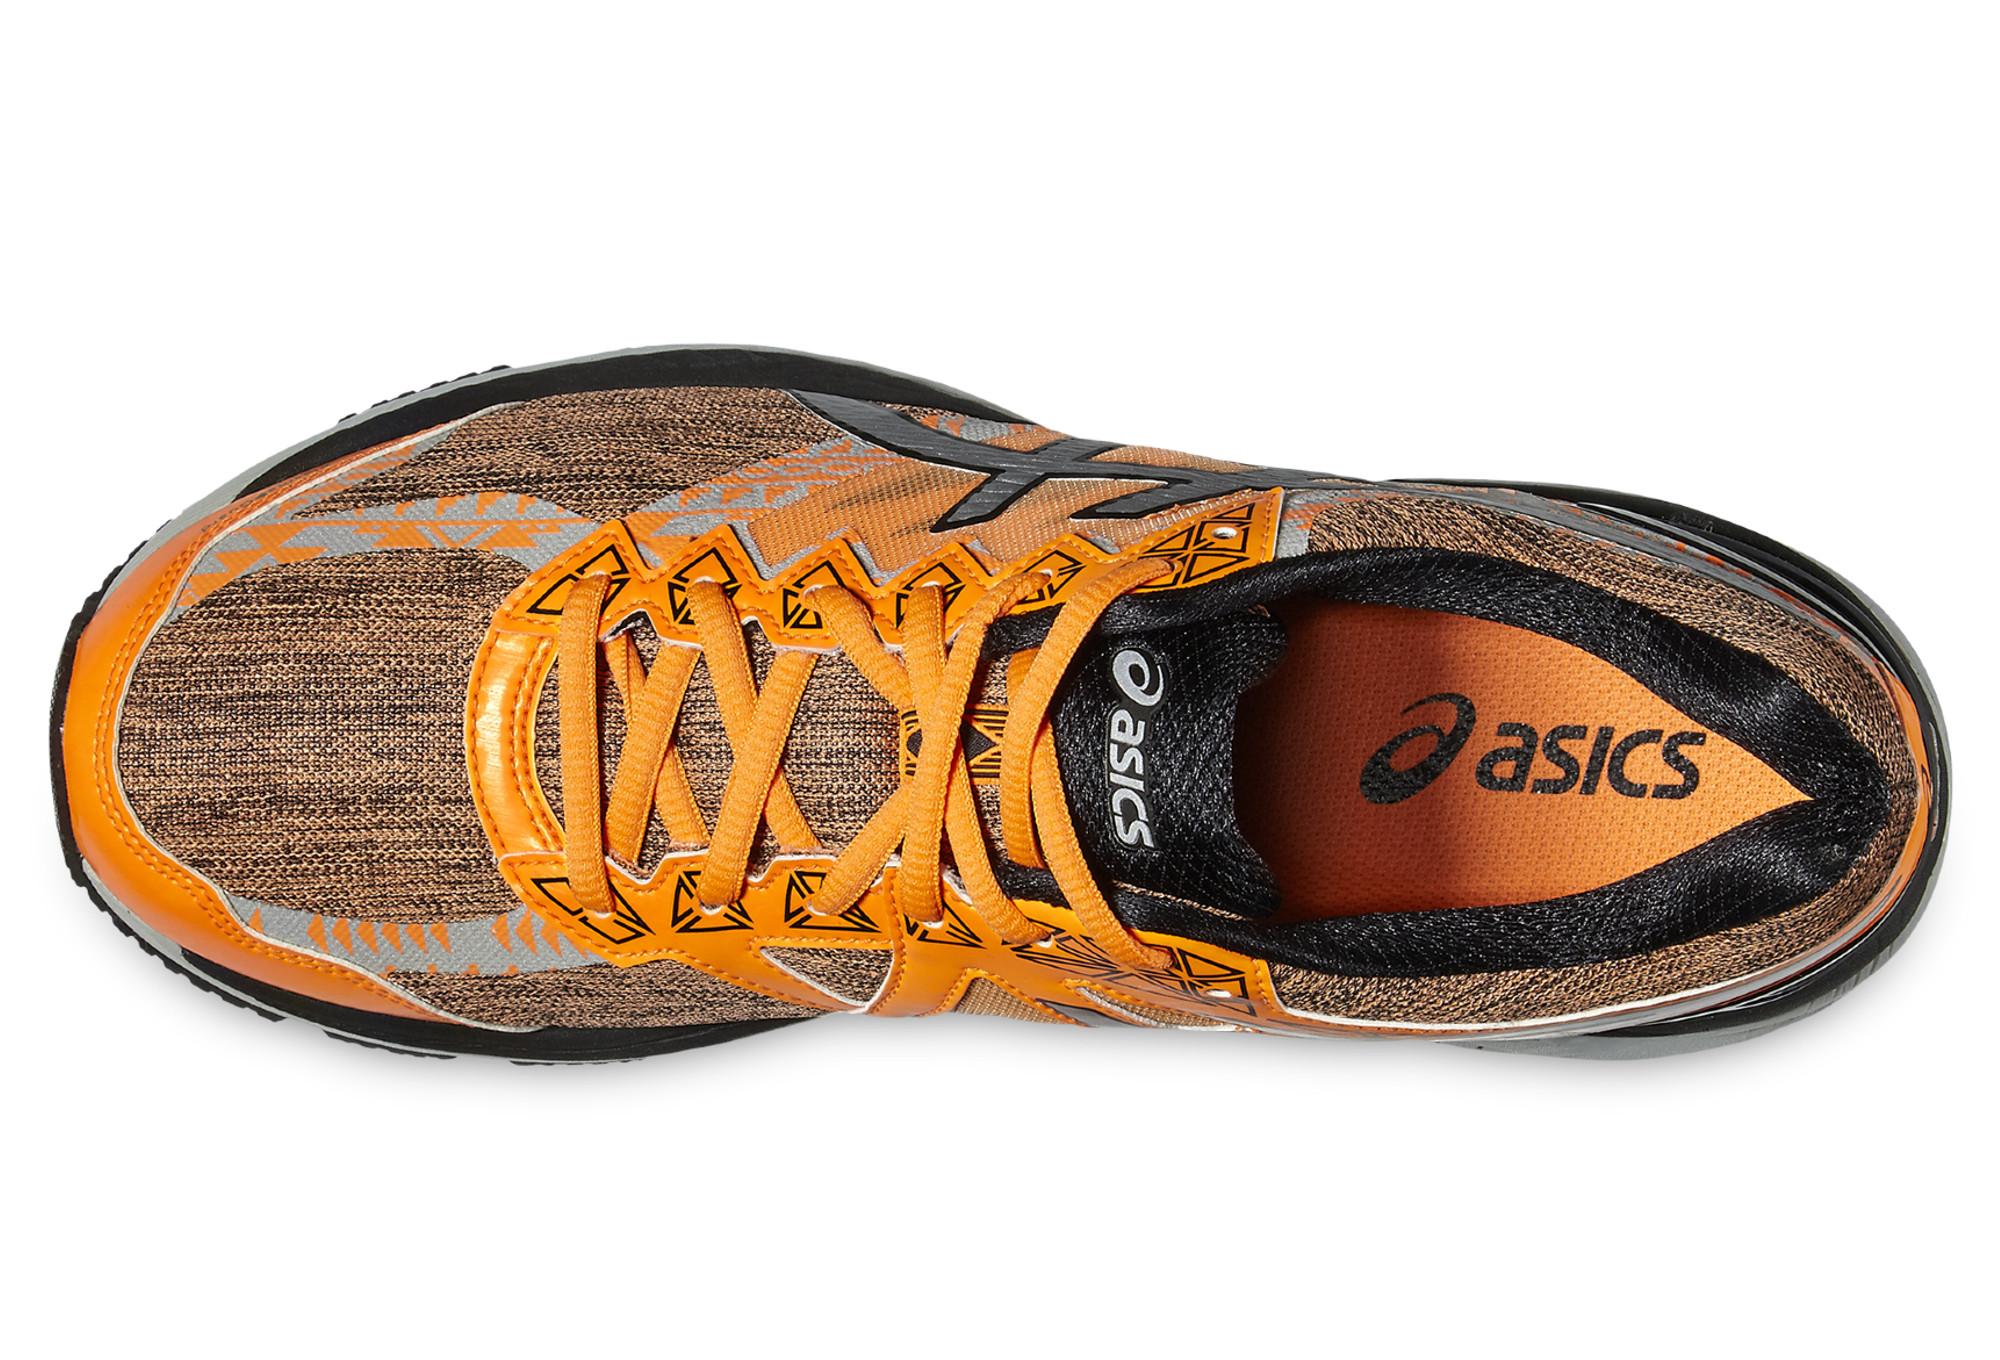 asics gt-2000 4 lite-show plasmaguard zapatilla de running